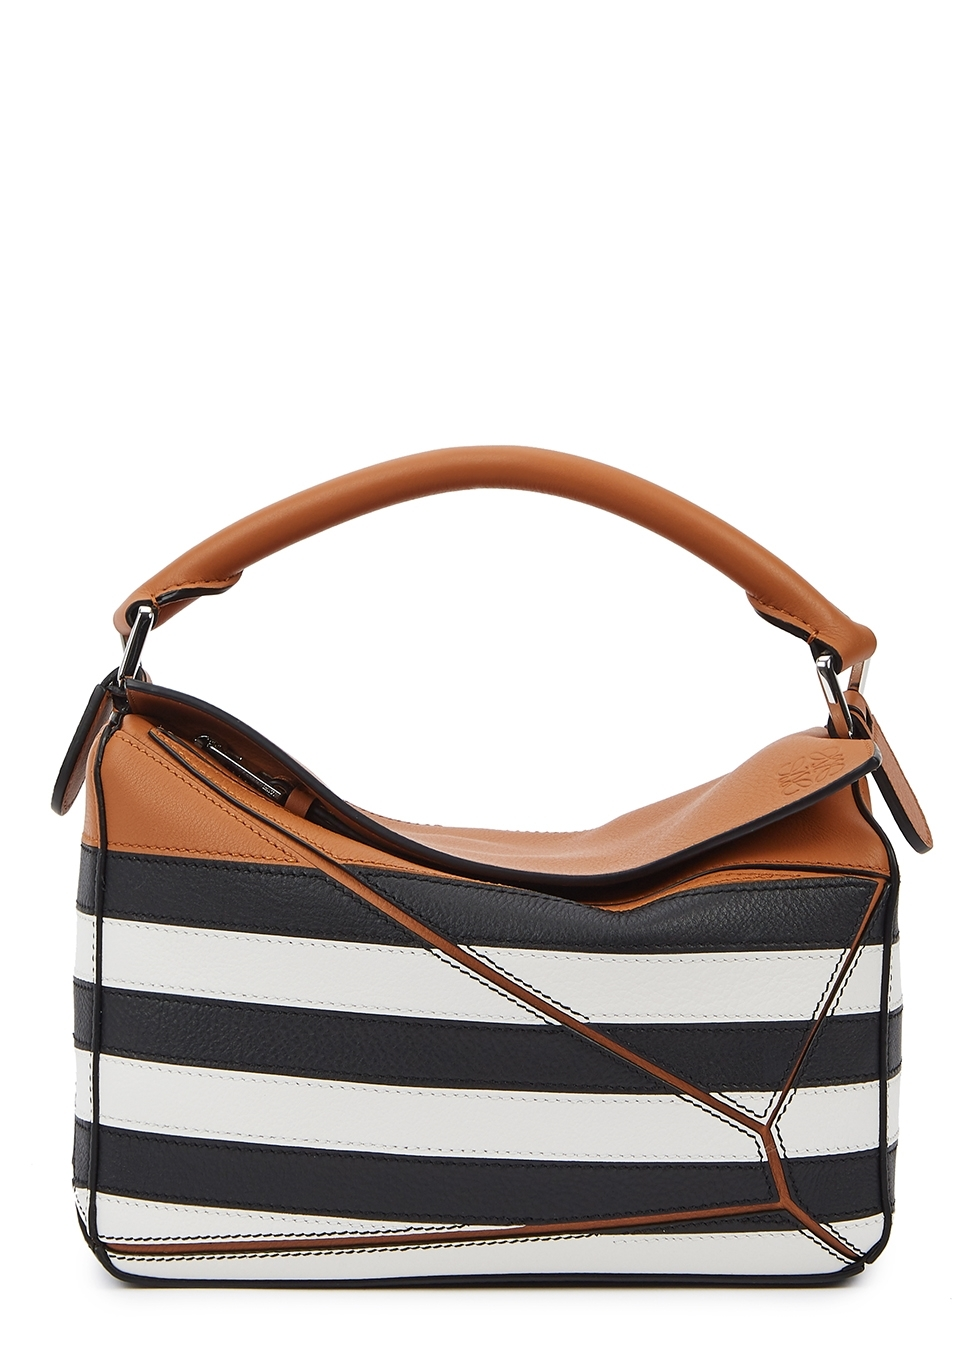 5e3274d49b7 Women's Designer Bags, Handbags and Purses - Harvey Nichols